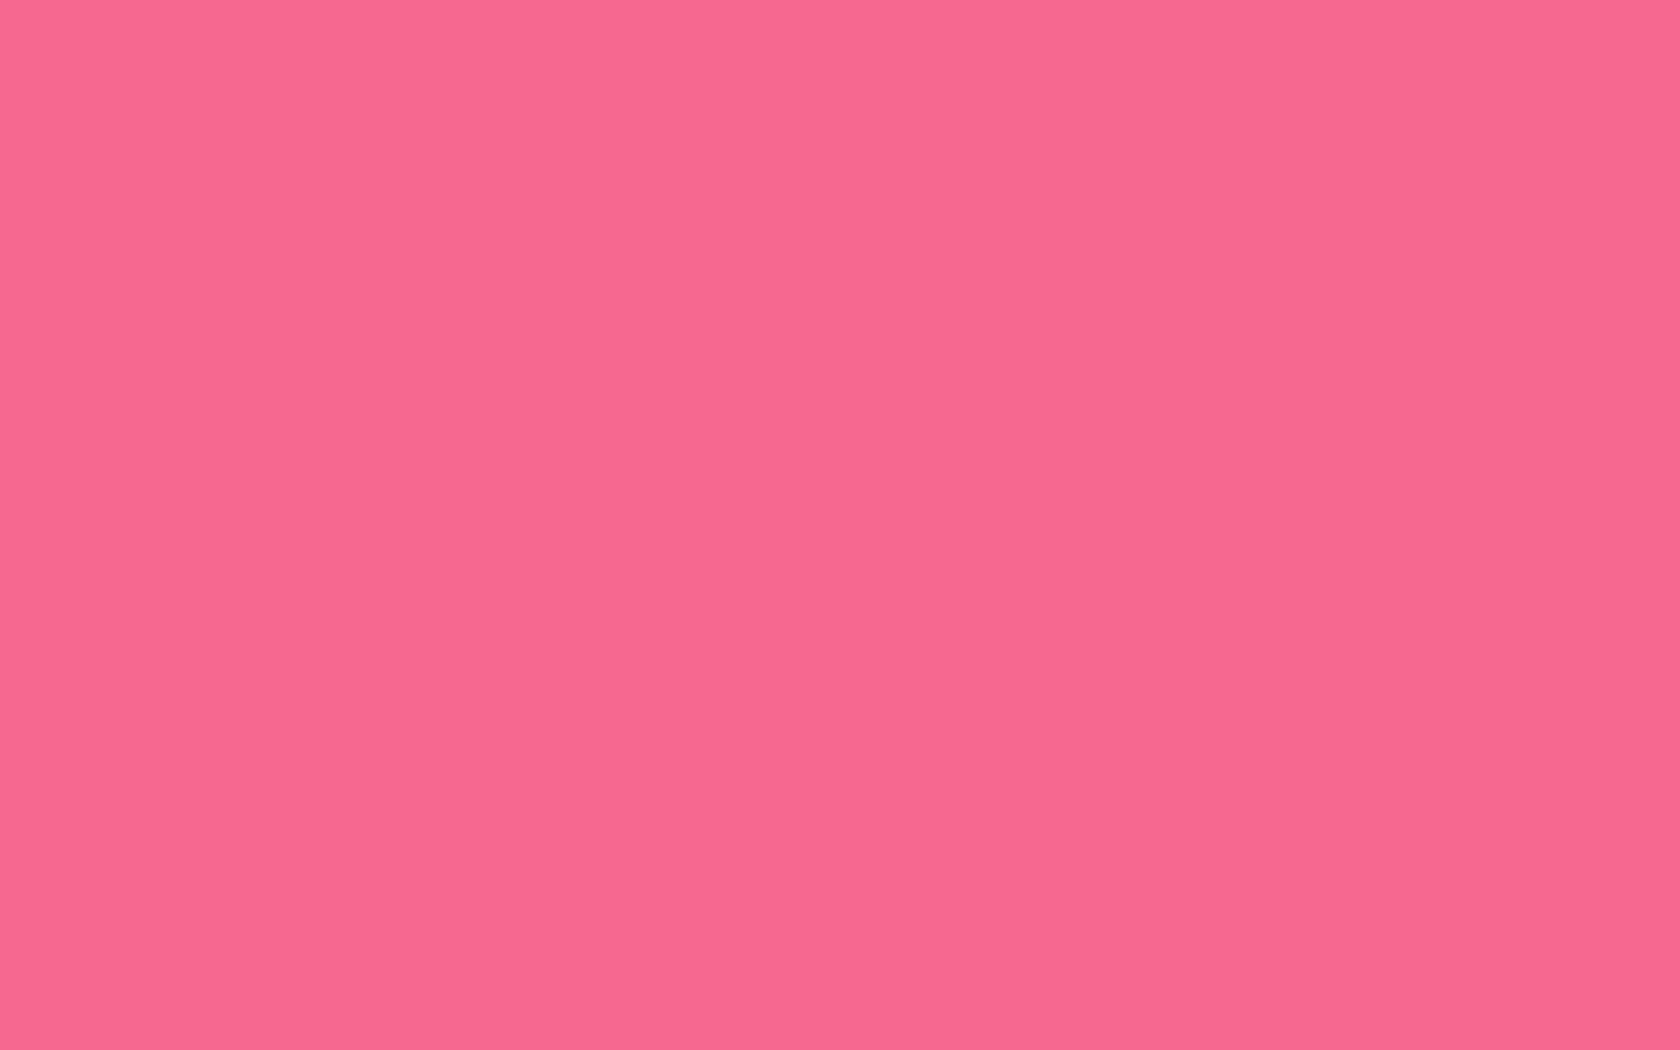 1680x1050 Light Crimson Solid Color Background